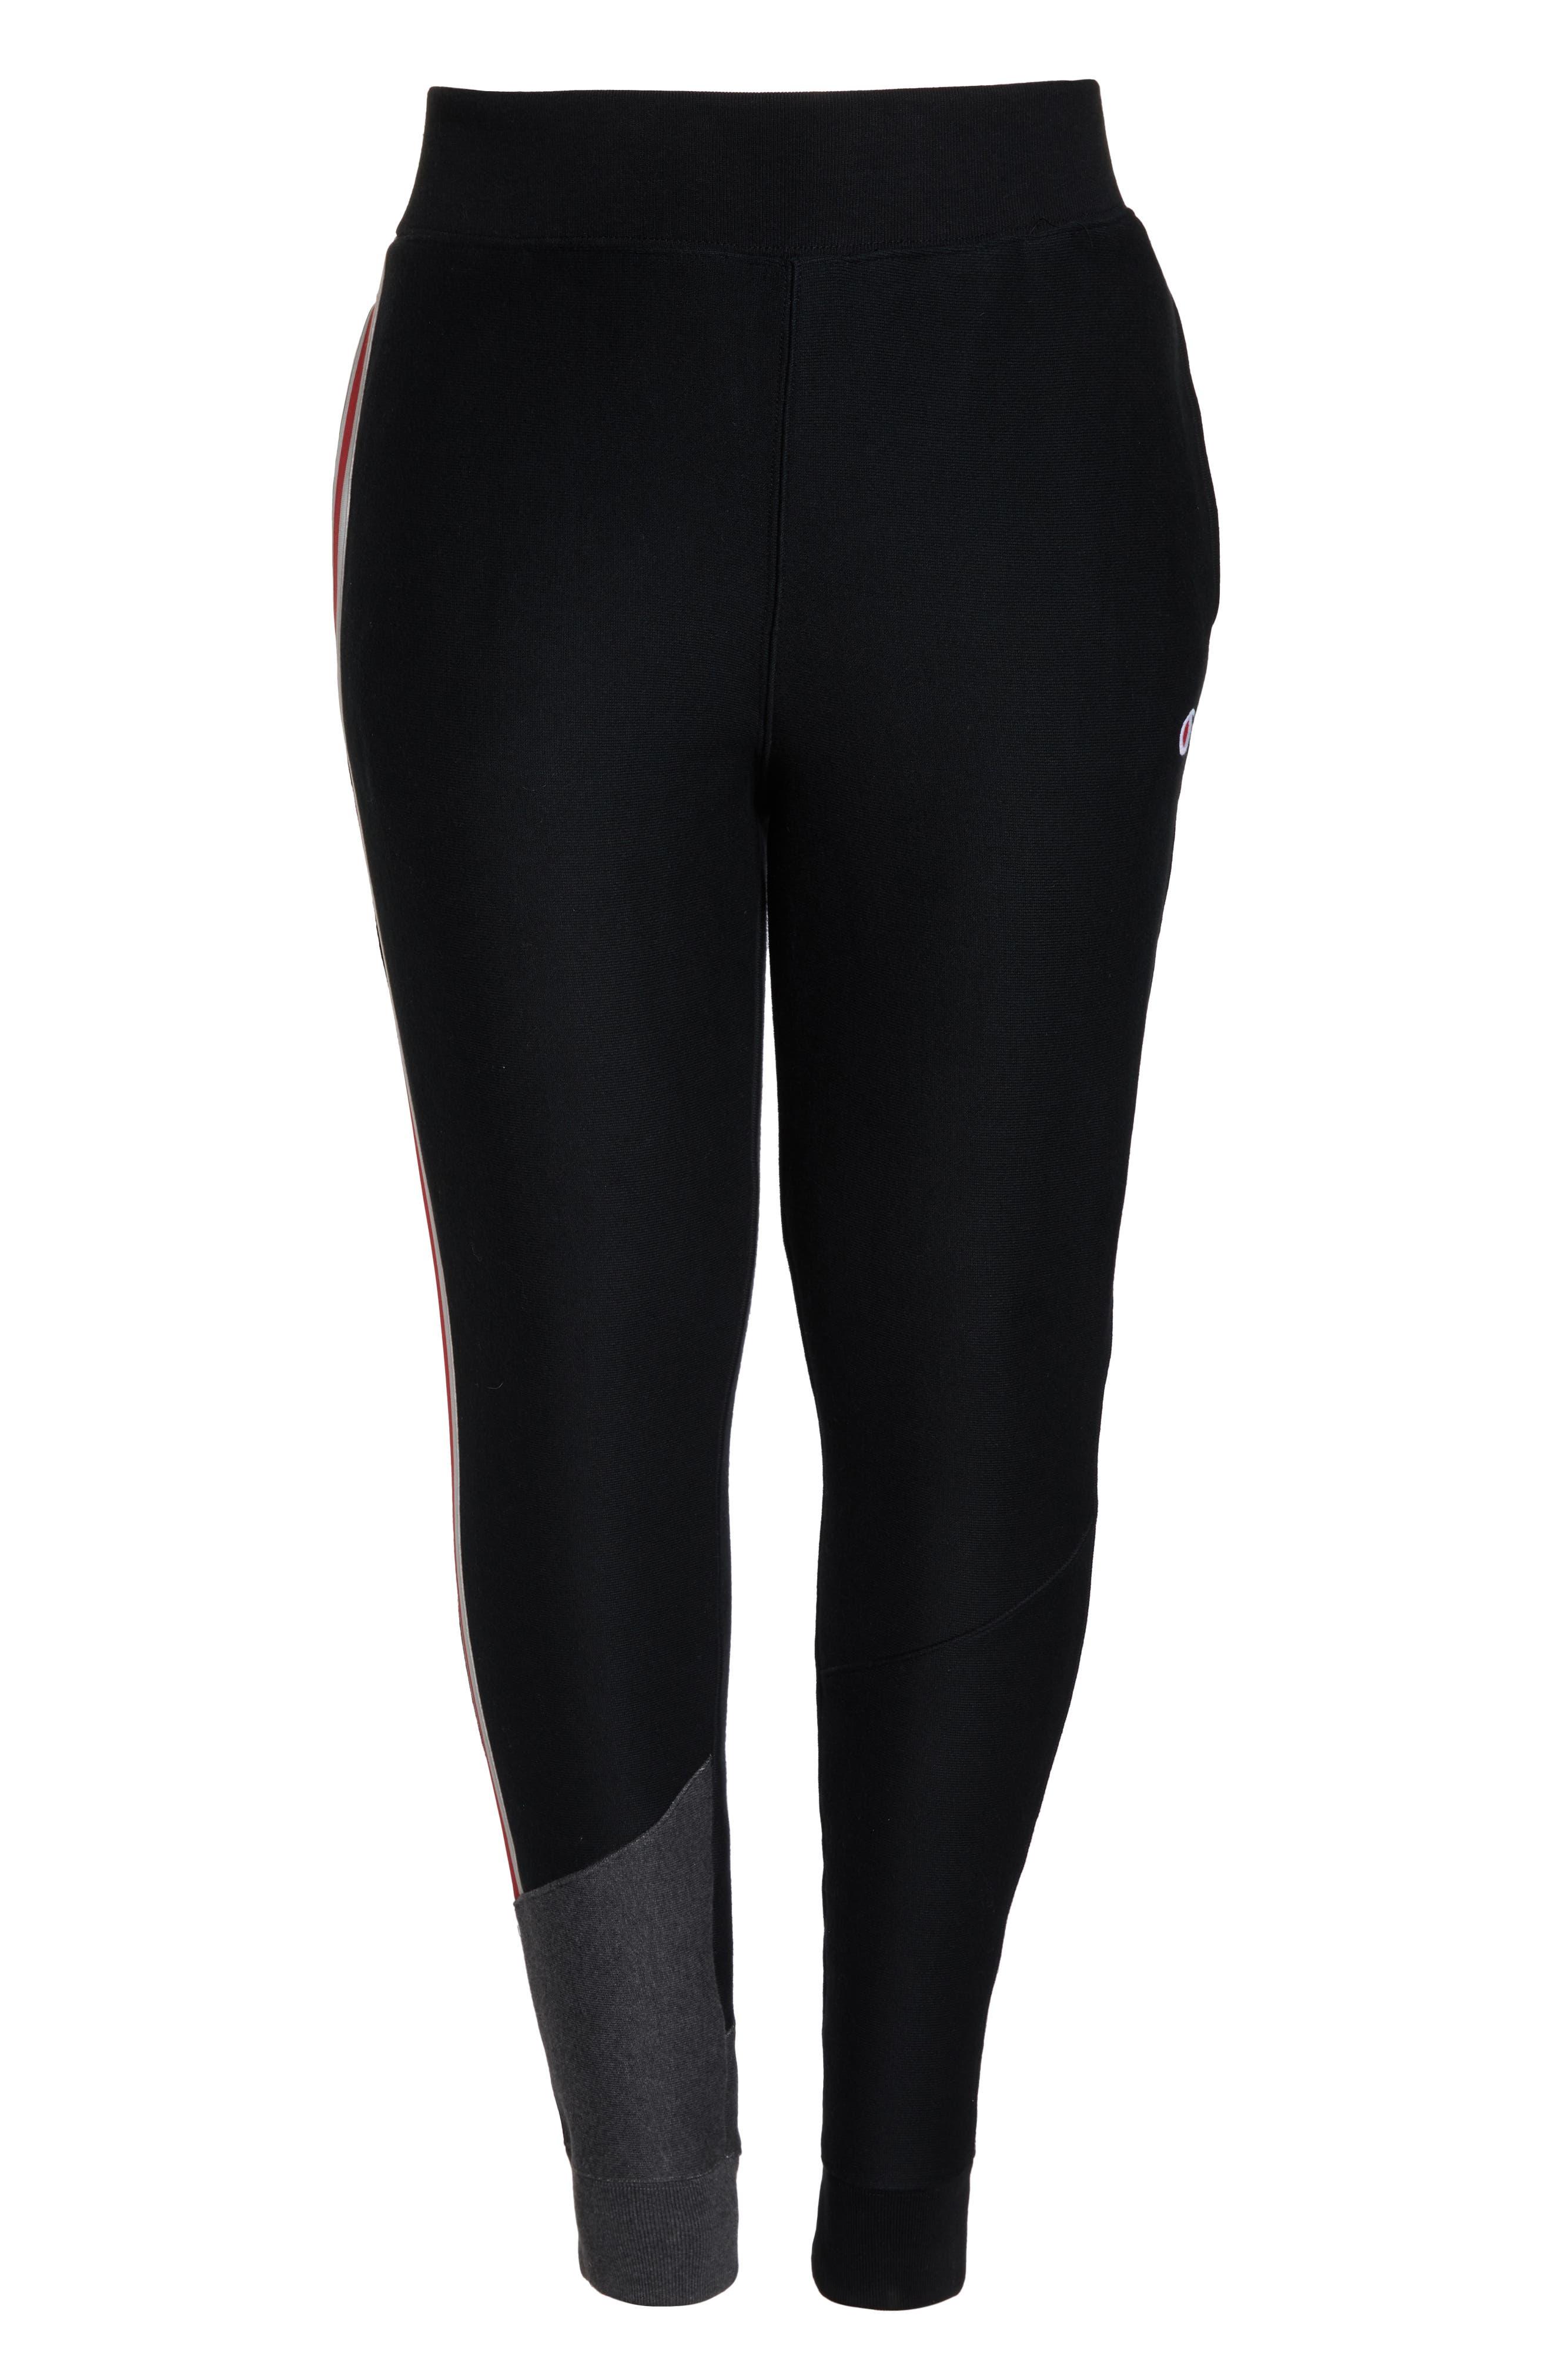 Color Block Jogger Pants,                             Alternate thumbnail 10, color,                             BLACK/ GRANITE HEATHER